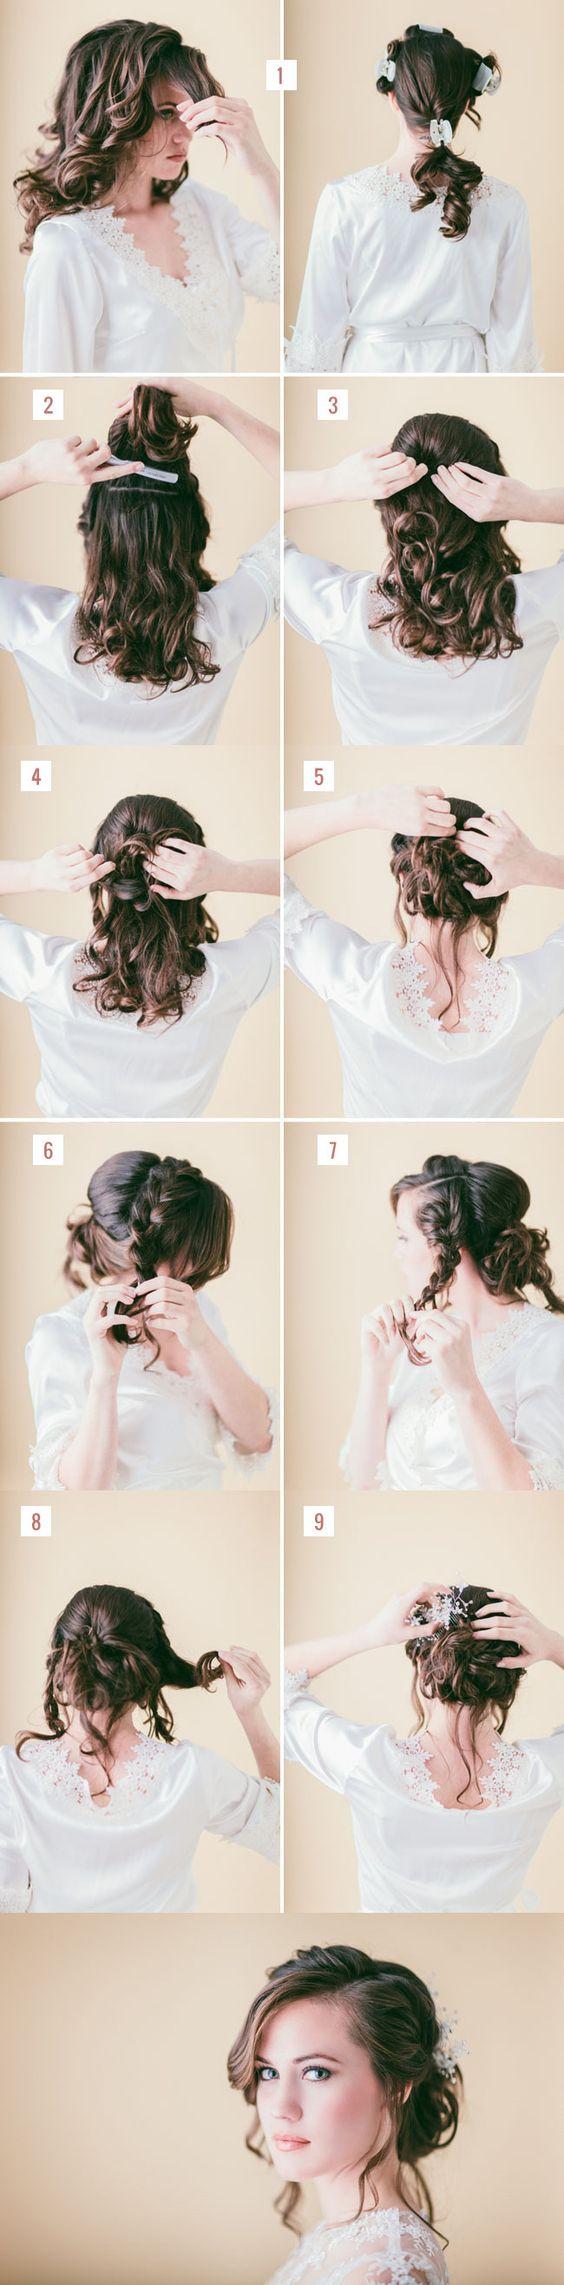 Hair Tutorial: Loose Braided Updo | Braided Updo, Updo ...